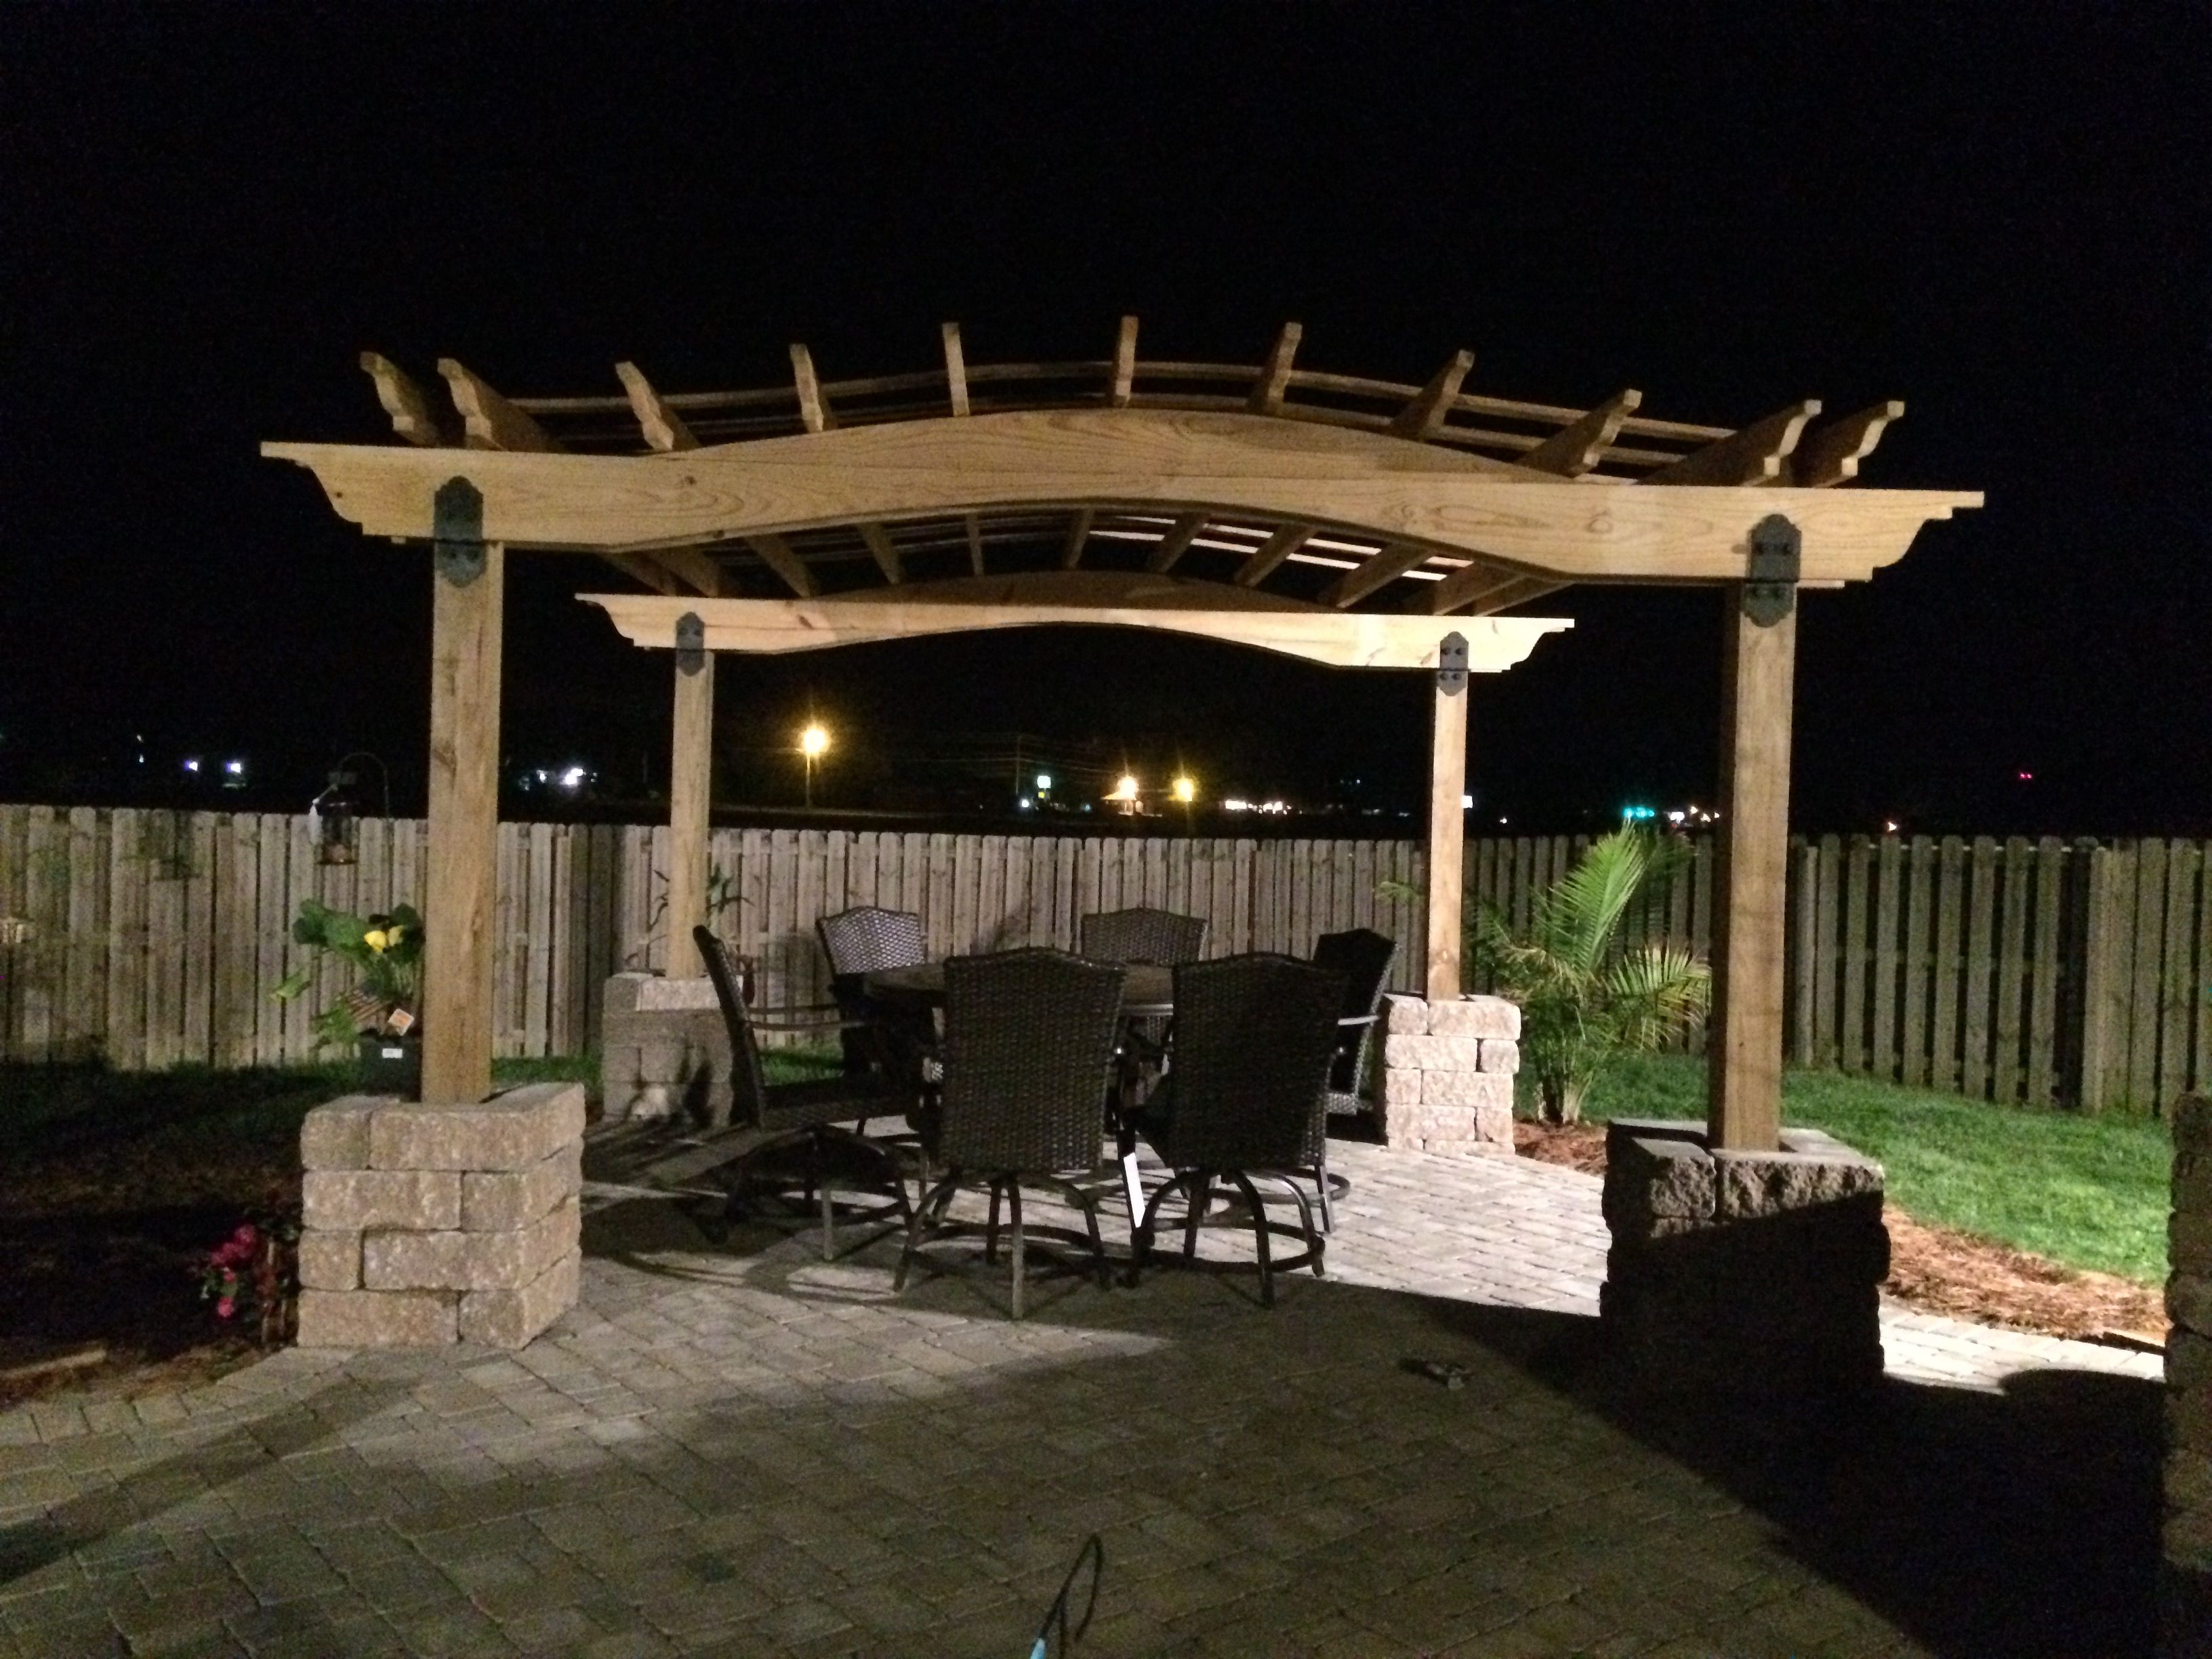 curved 12x12 pergola my husband built in our backyard backyard